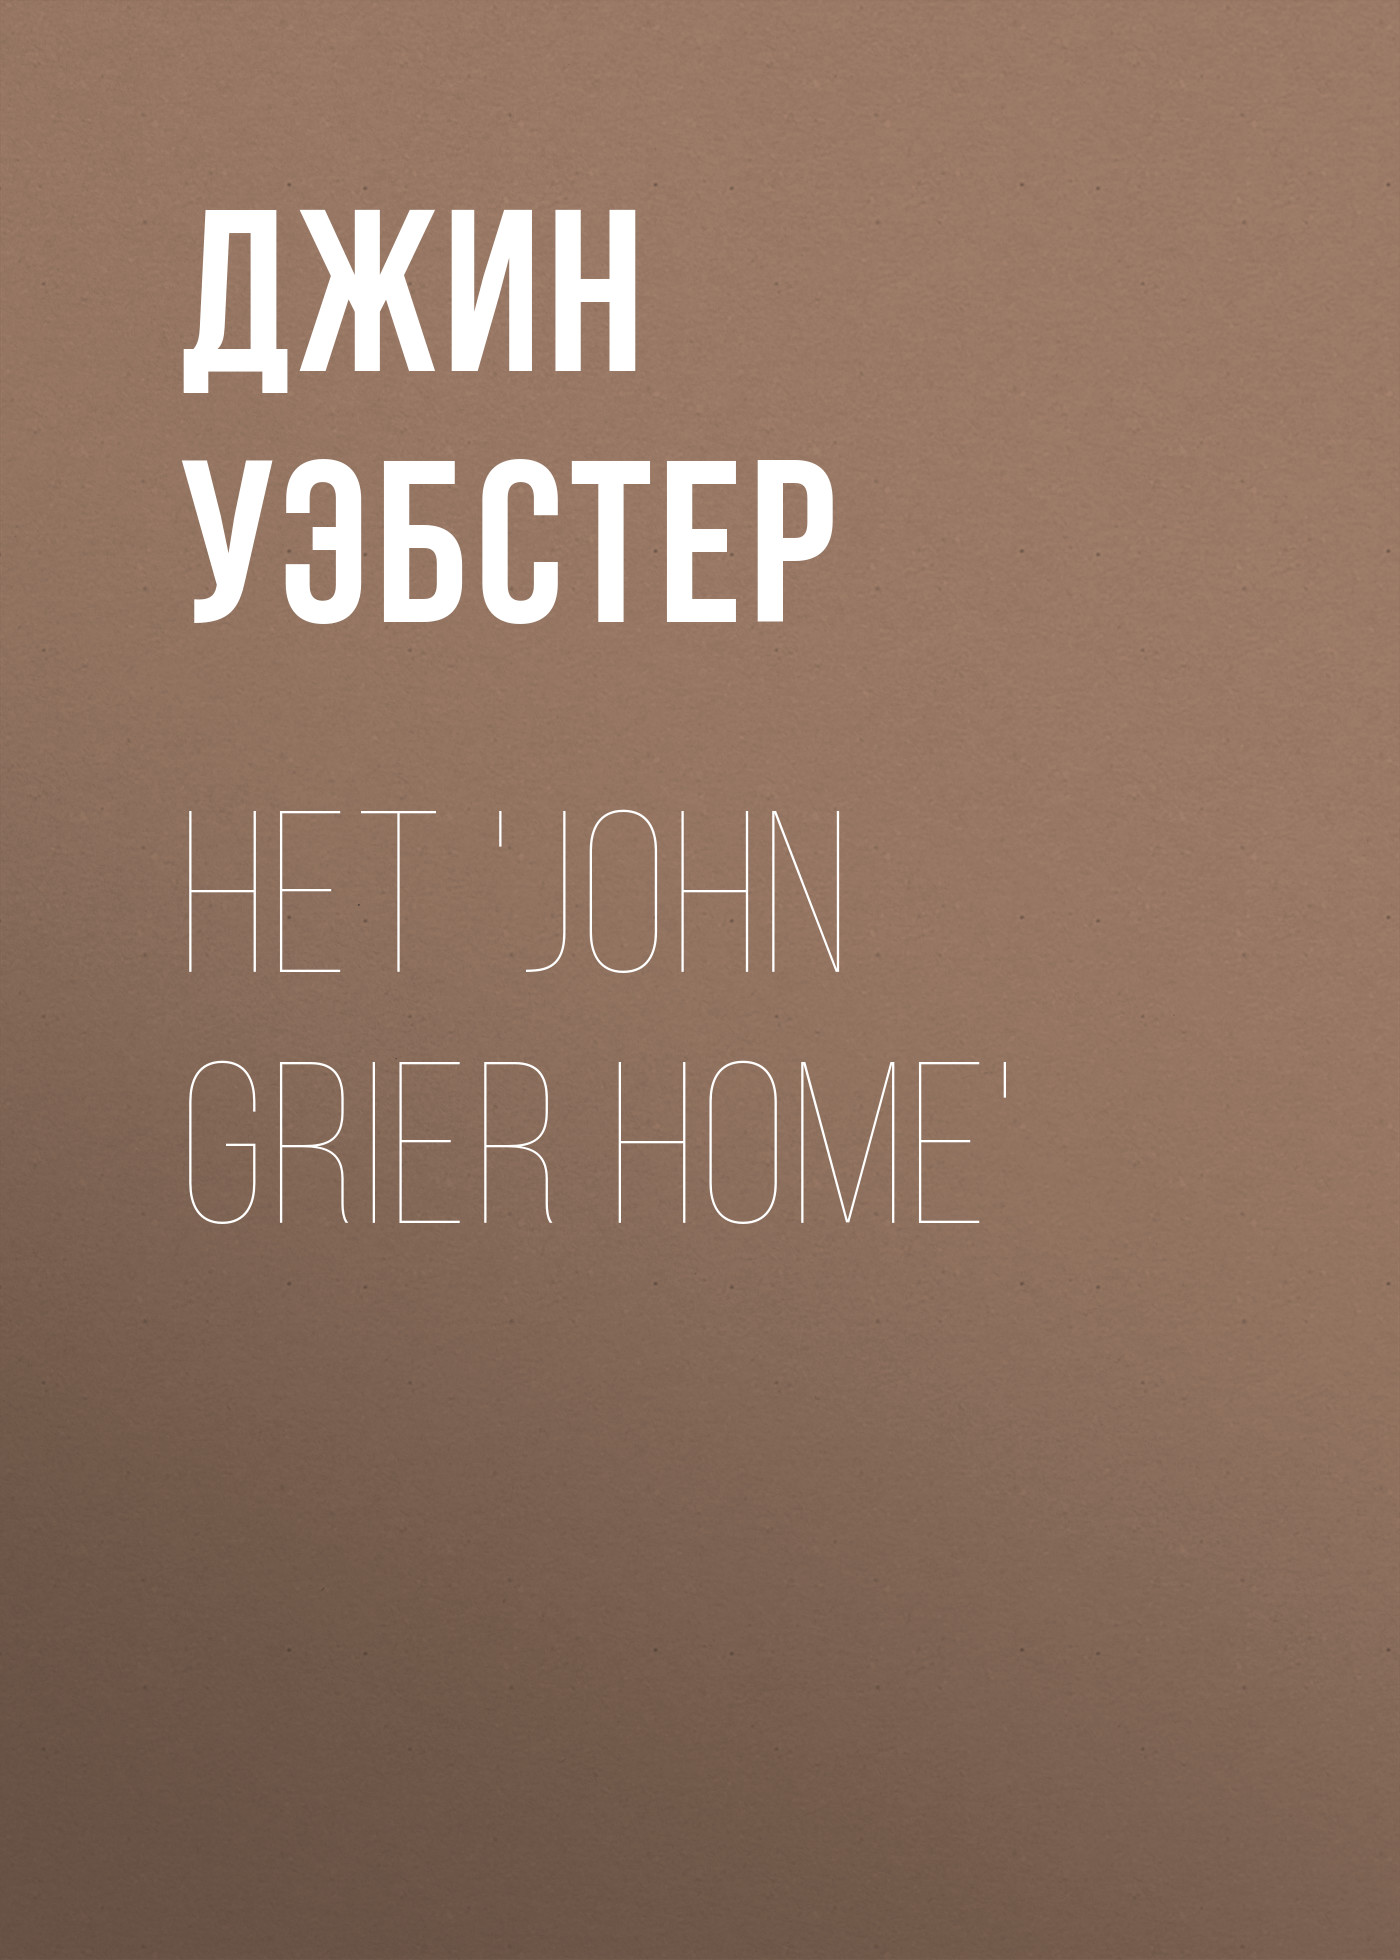 Джин Уэбстер Het 'John Grier Home' david grier alan crowdsourcing for dummies